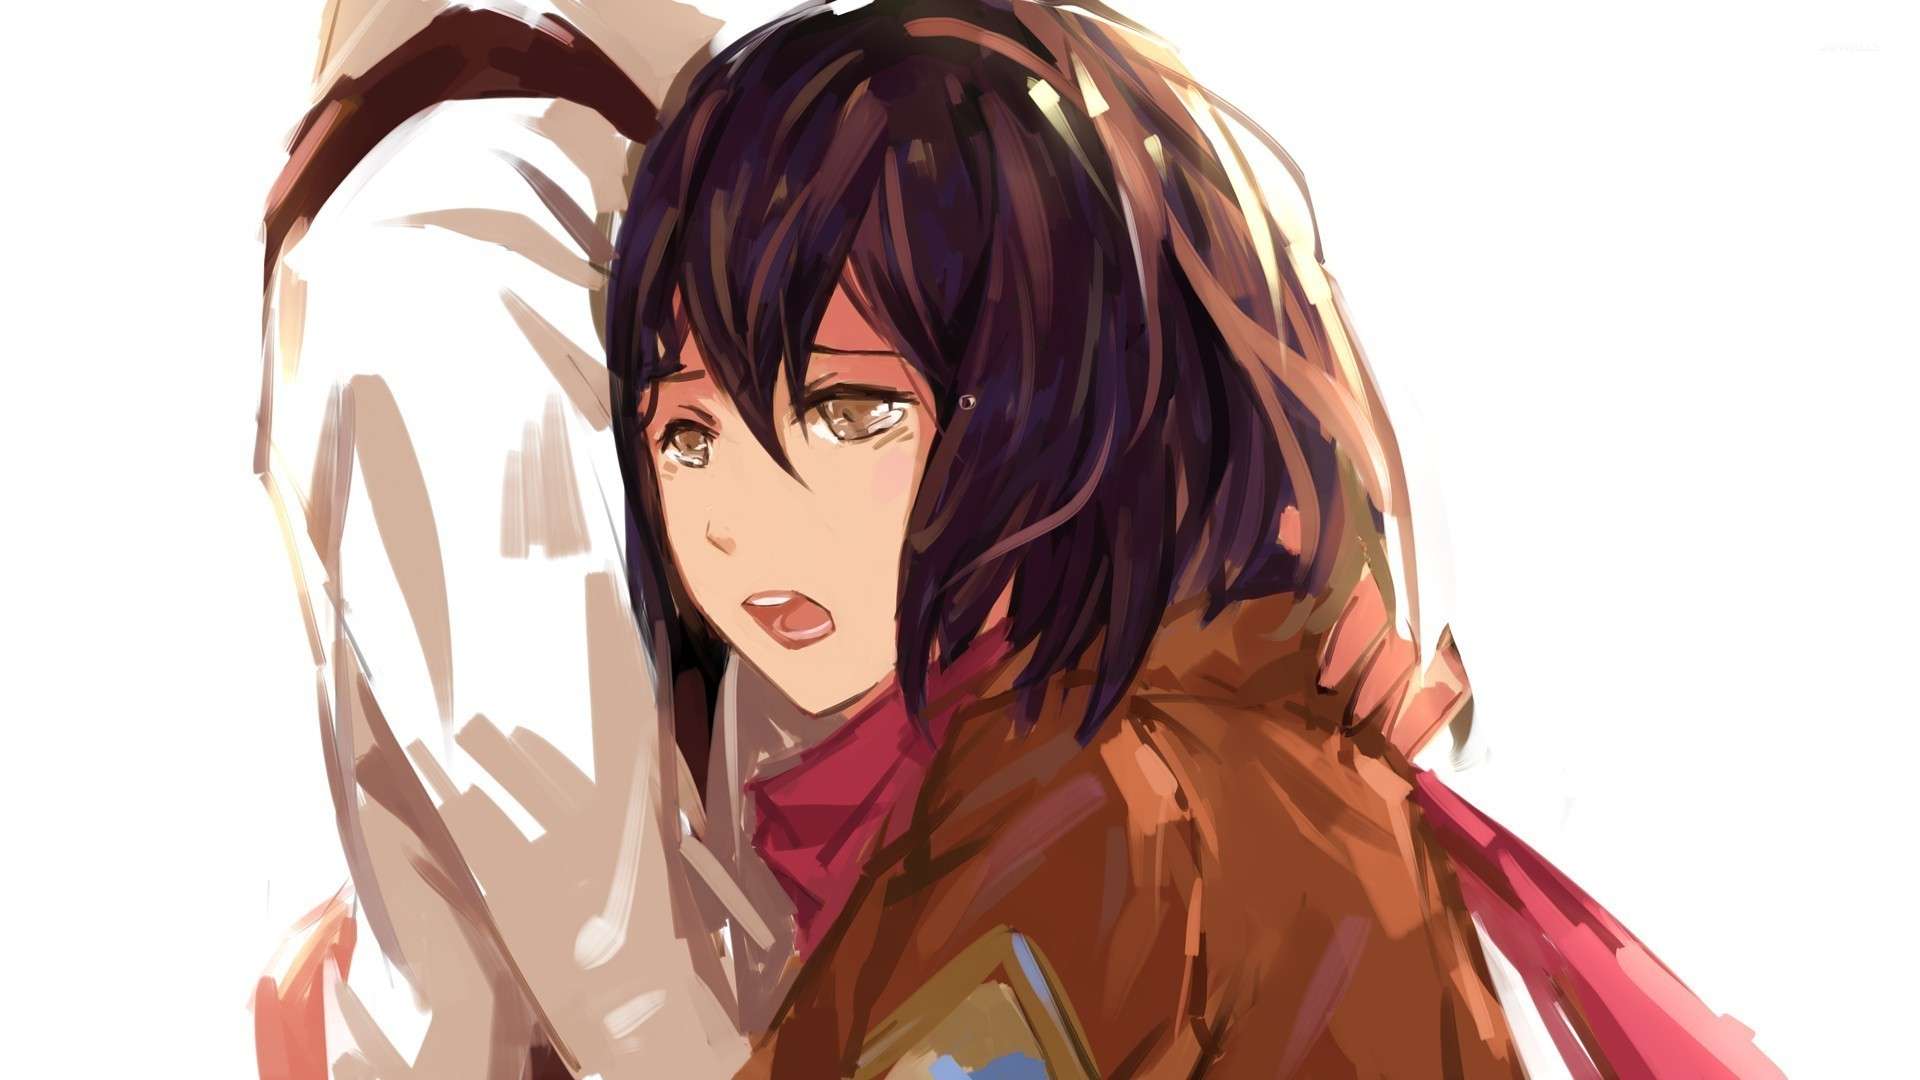 Mikasa ackerman from attack on titan wallpaper anime wallpapers mikasa ackerman from attack on titan wallpaper voltagebd Image collections